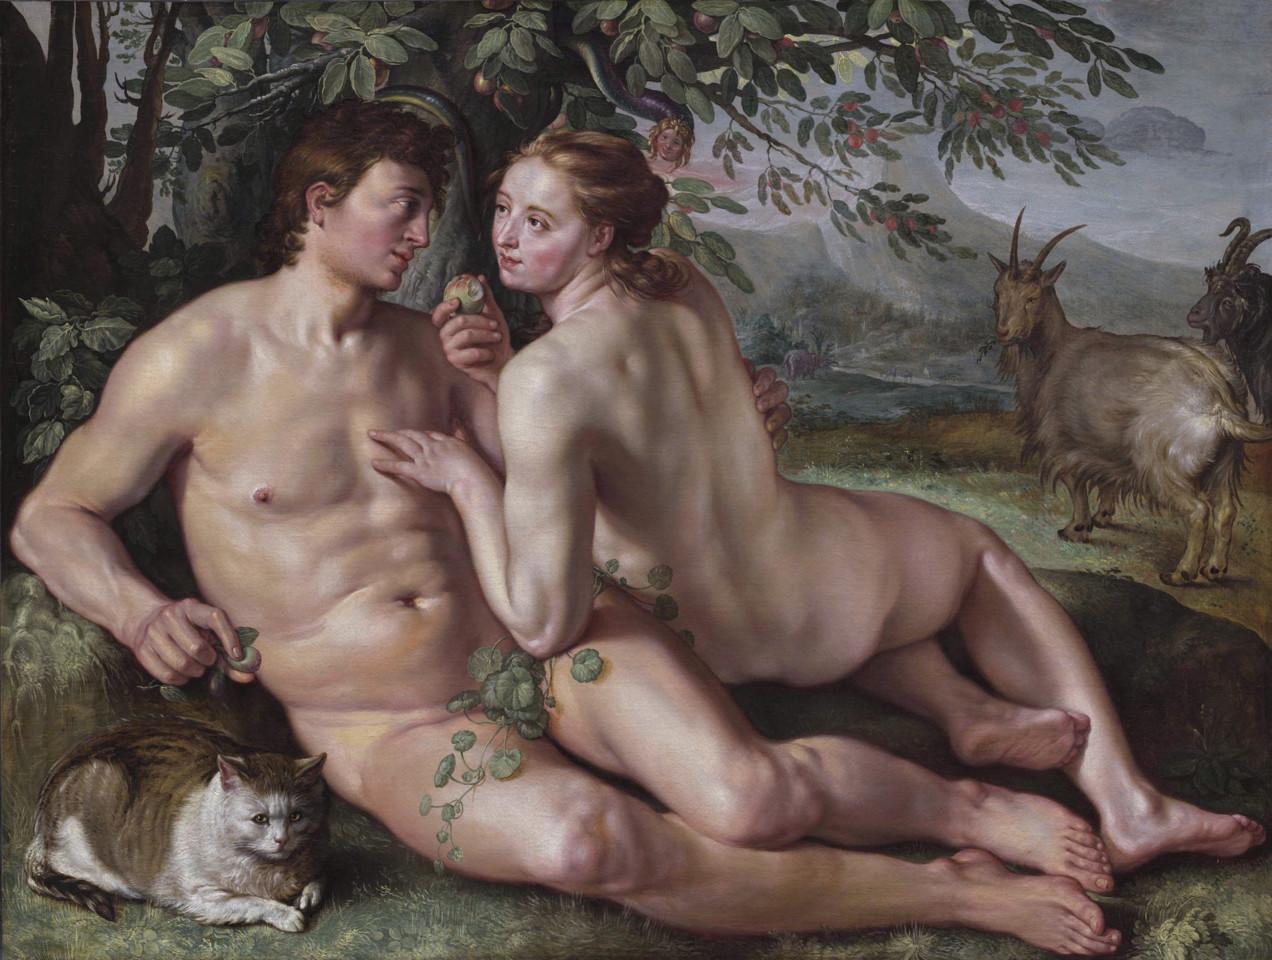 The_Fall_of_Man-1616-Hendrik_Goltzius.jpg